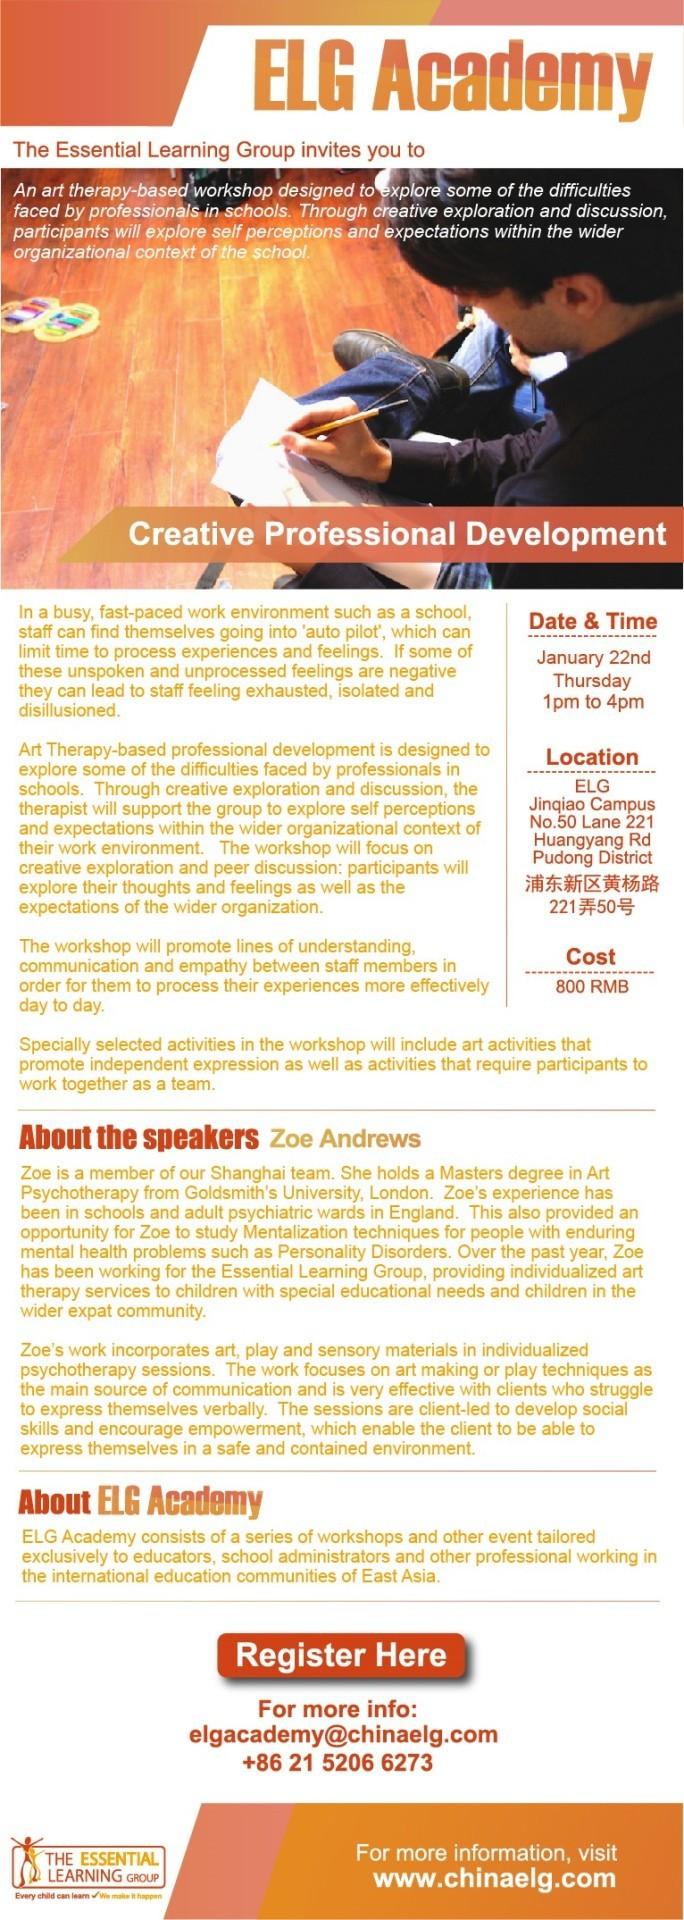 ELG Academy - Creative Professional Development